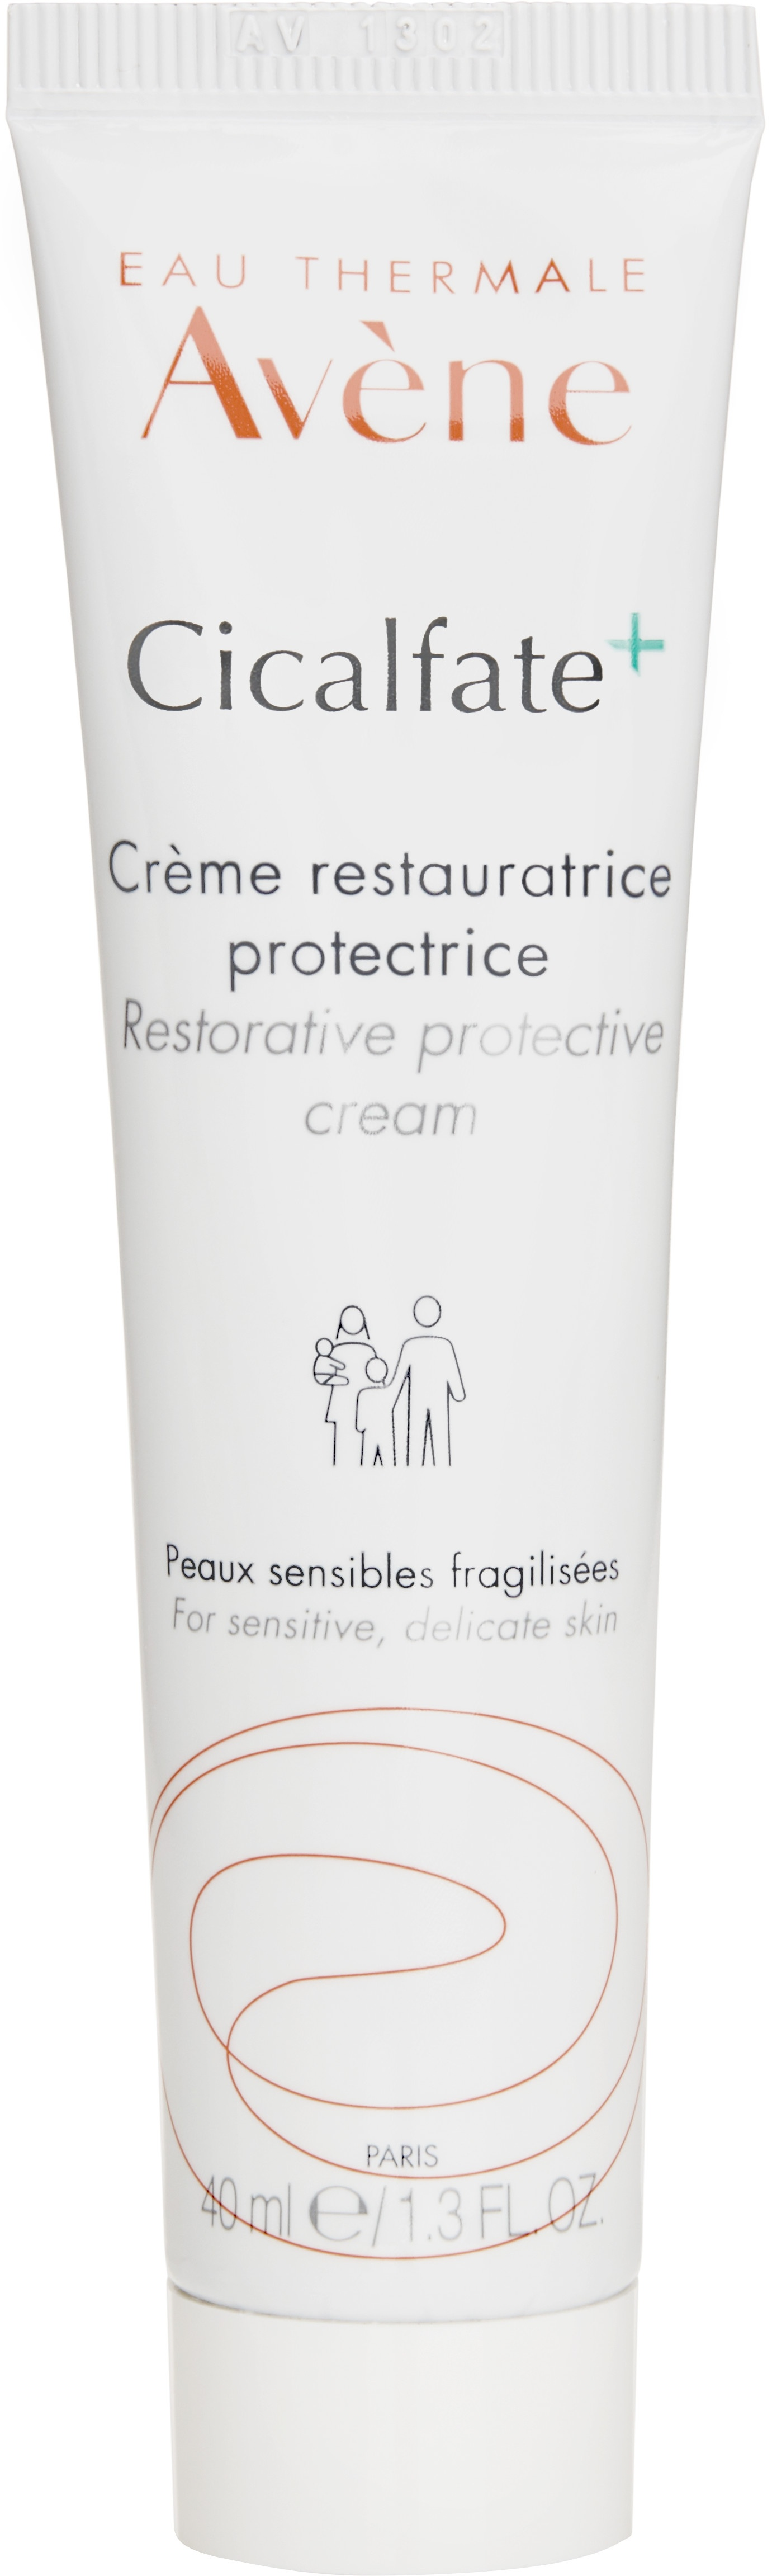 Avene Cicalfate+ Restorative Protective Cream 40ml